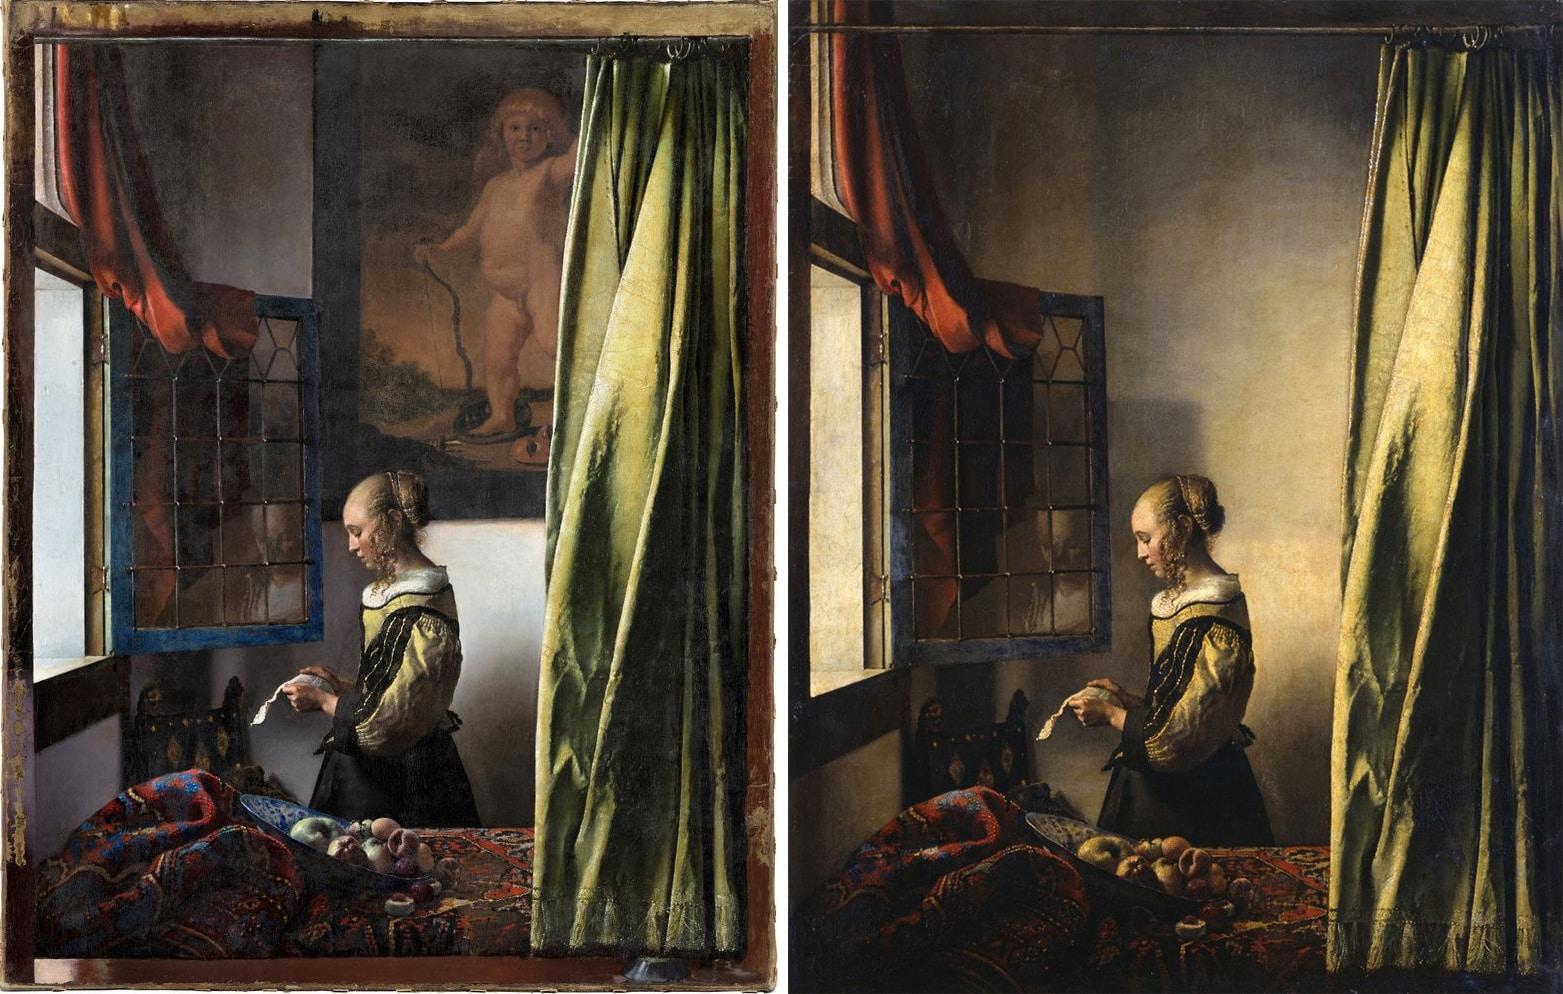 vermeer cuadro oculto